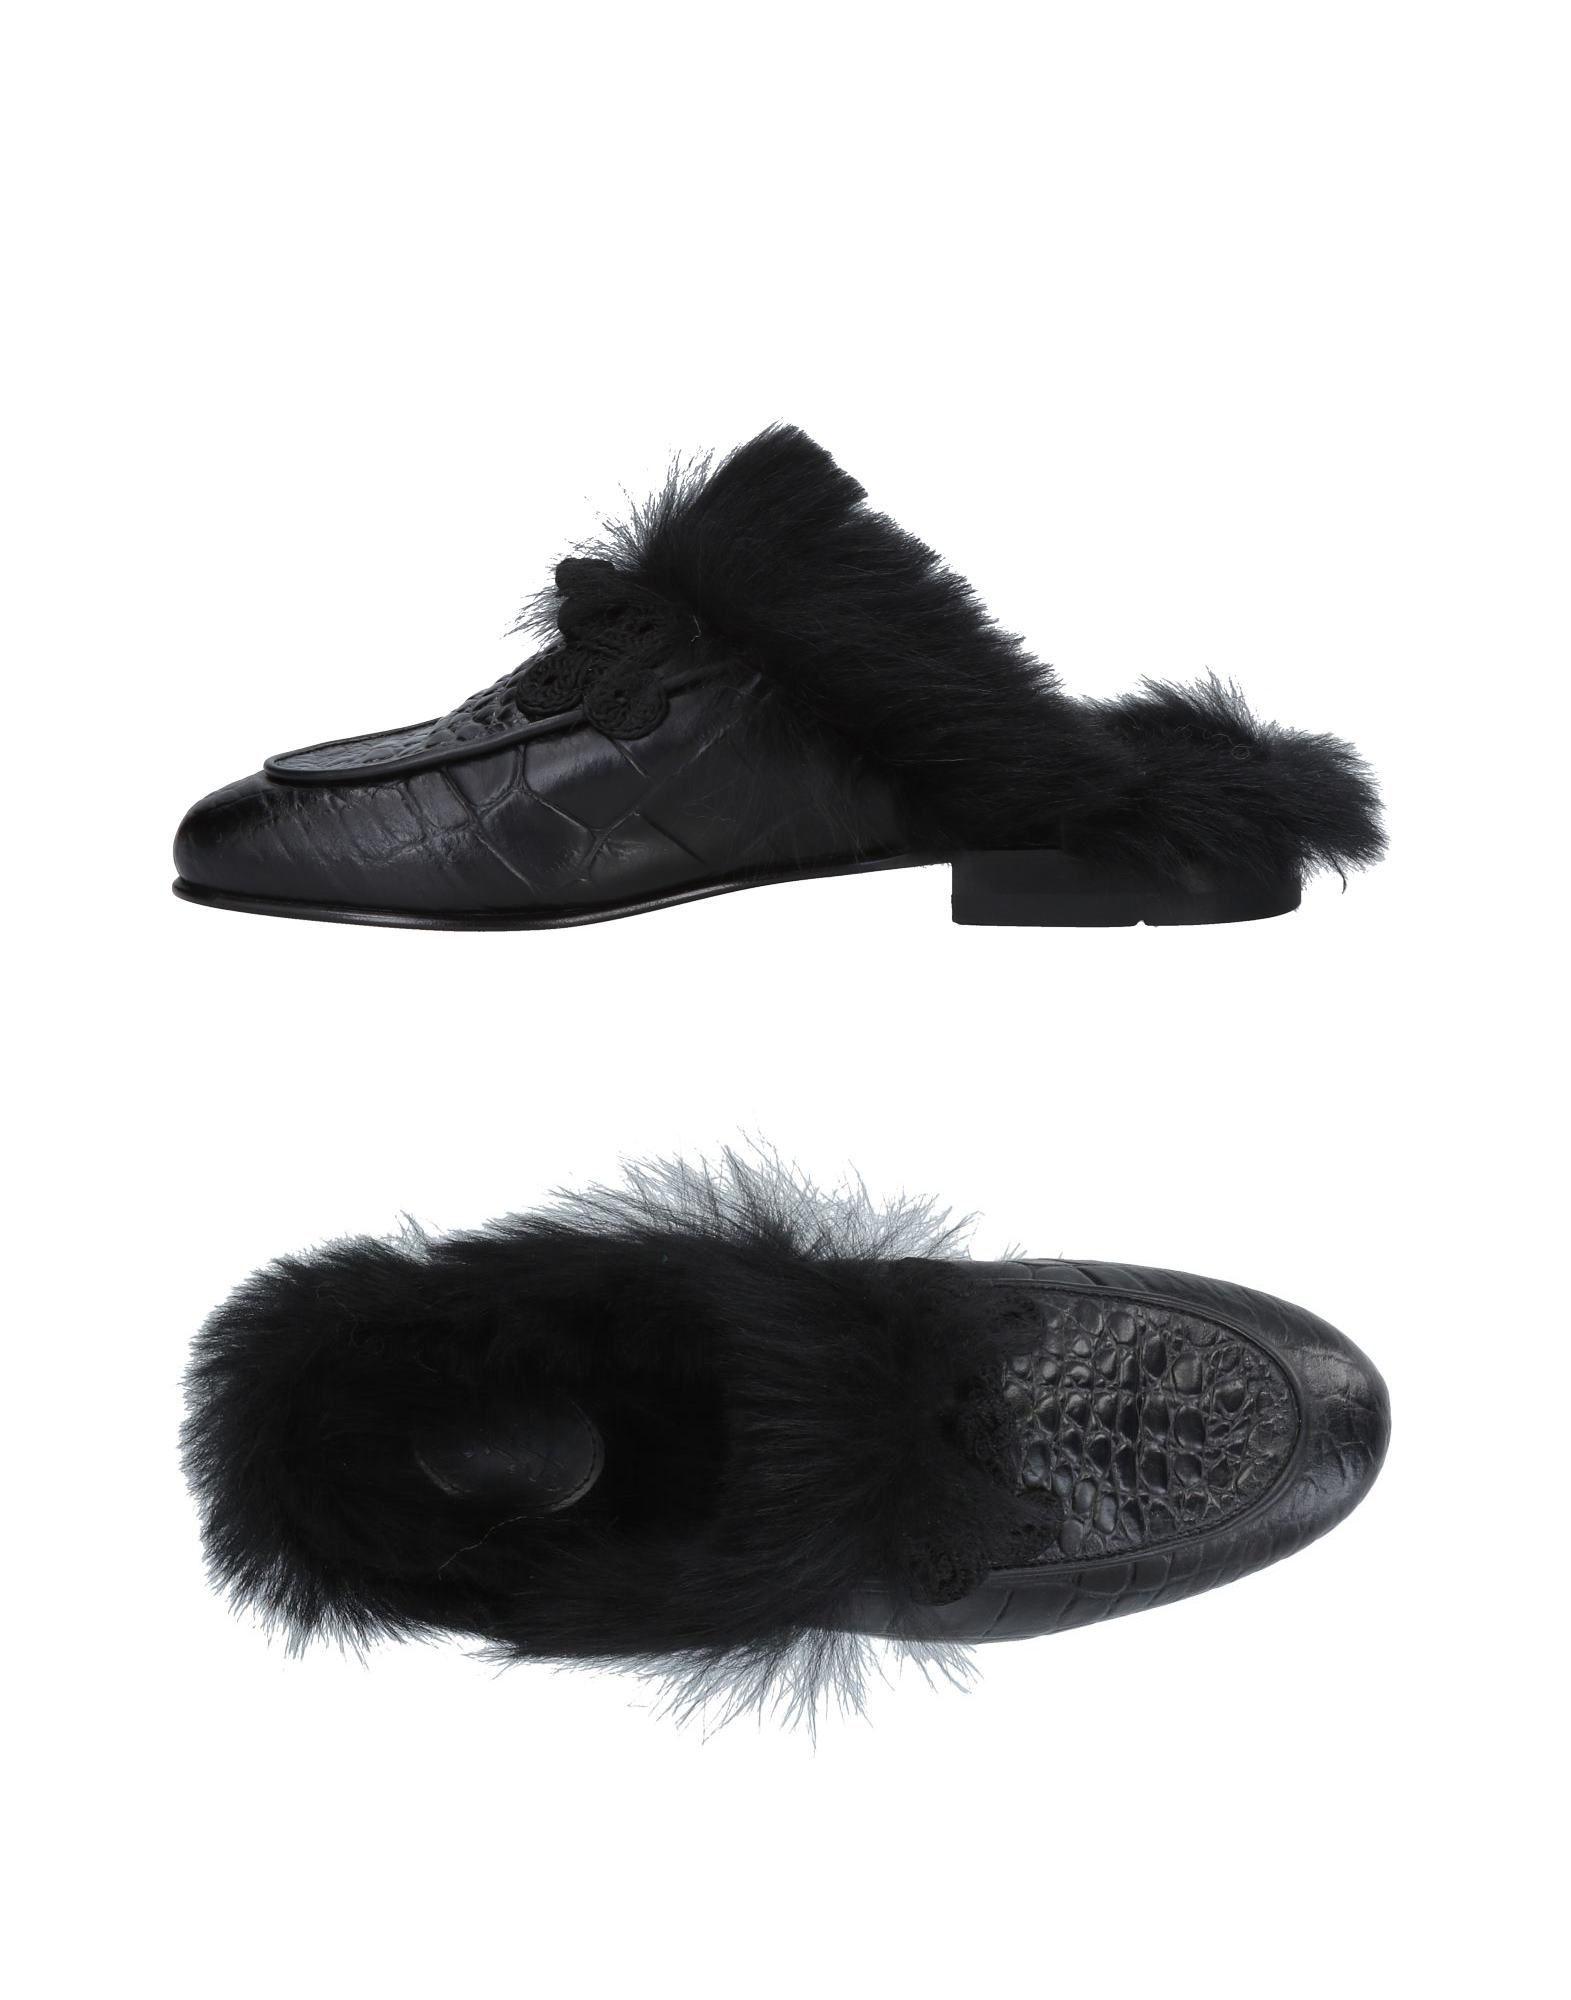 Stilvolle billige Schuhe Damen Passion Blanche Pantoletten Damen Schuhe  11491638KV 49ab2d